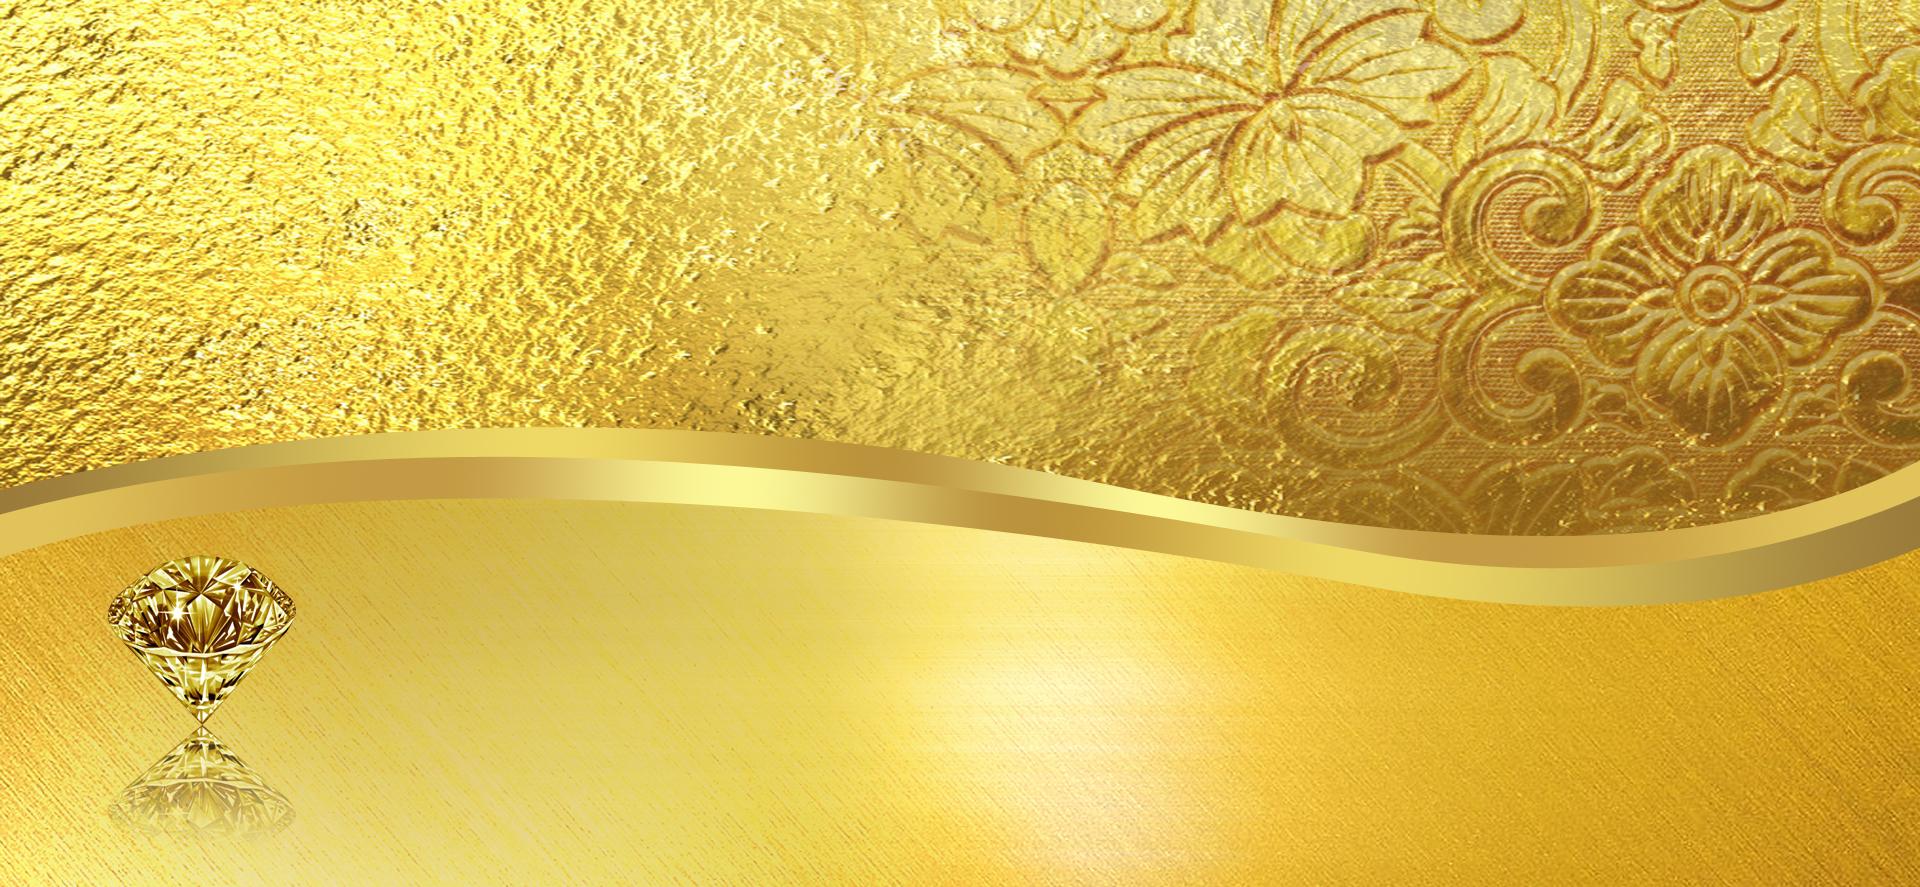 luxurious texture pattern golden background banner